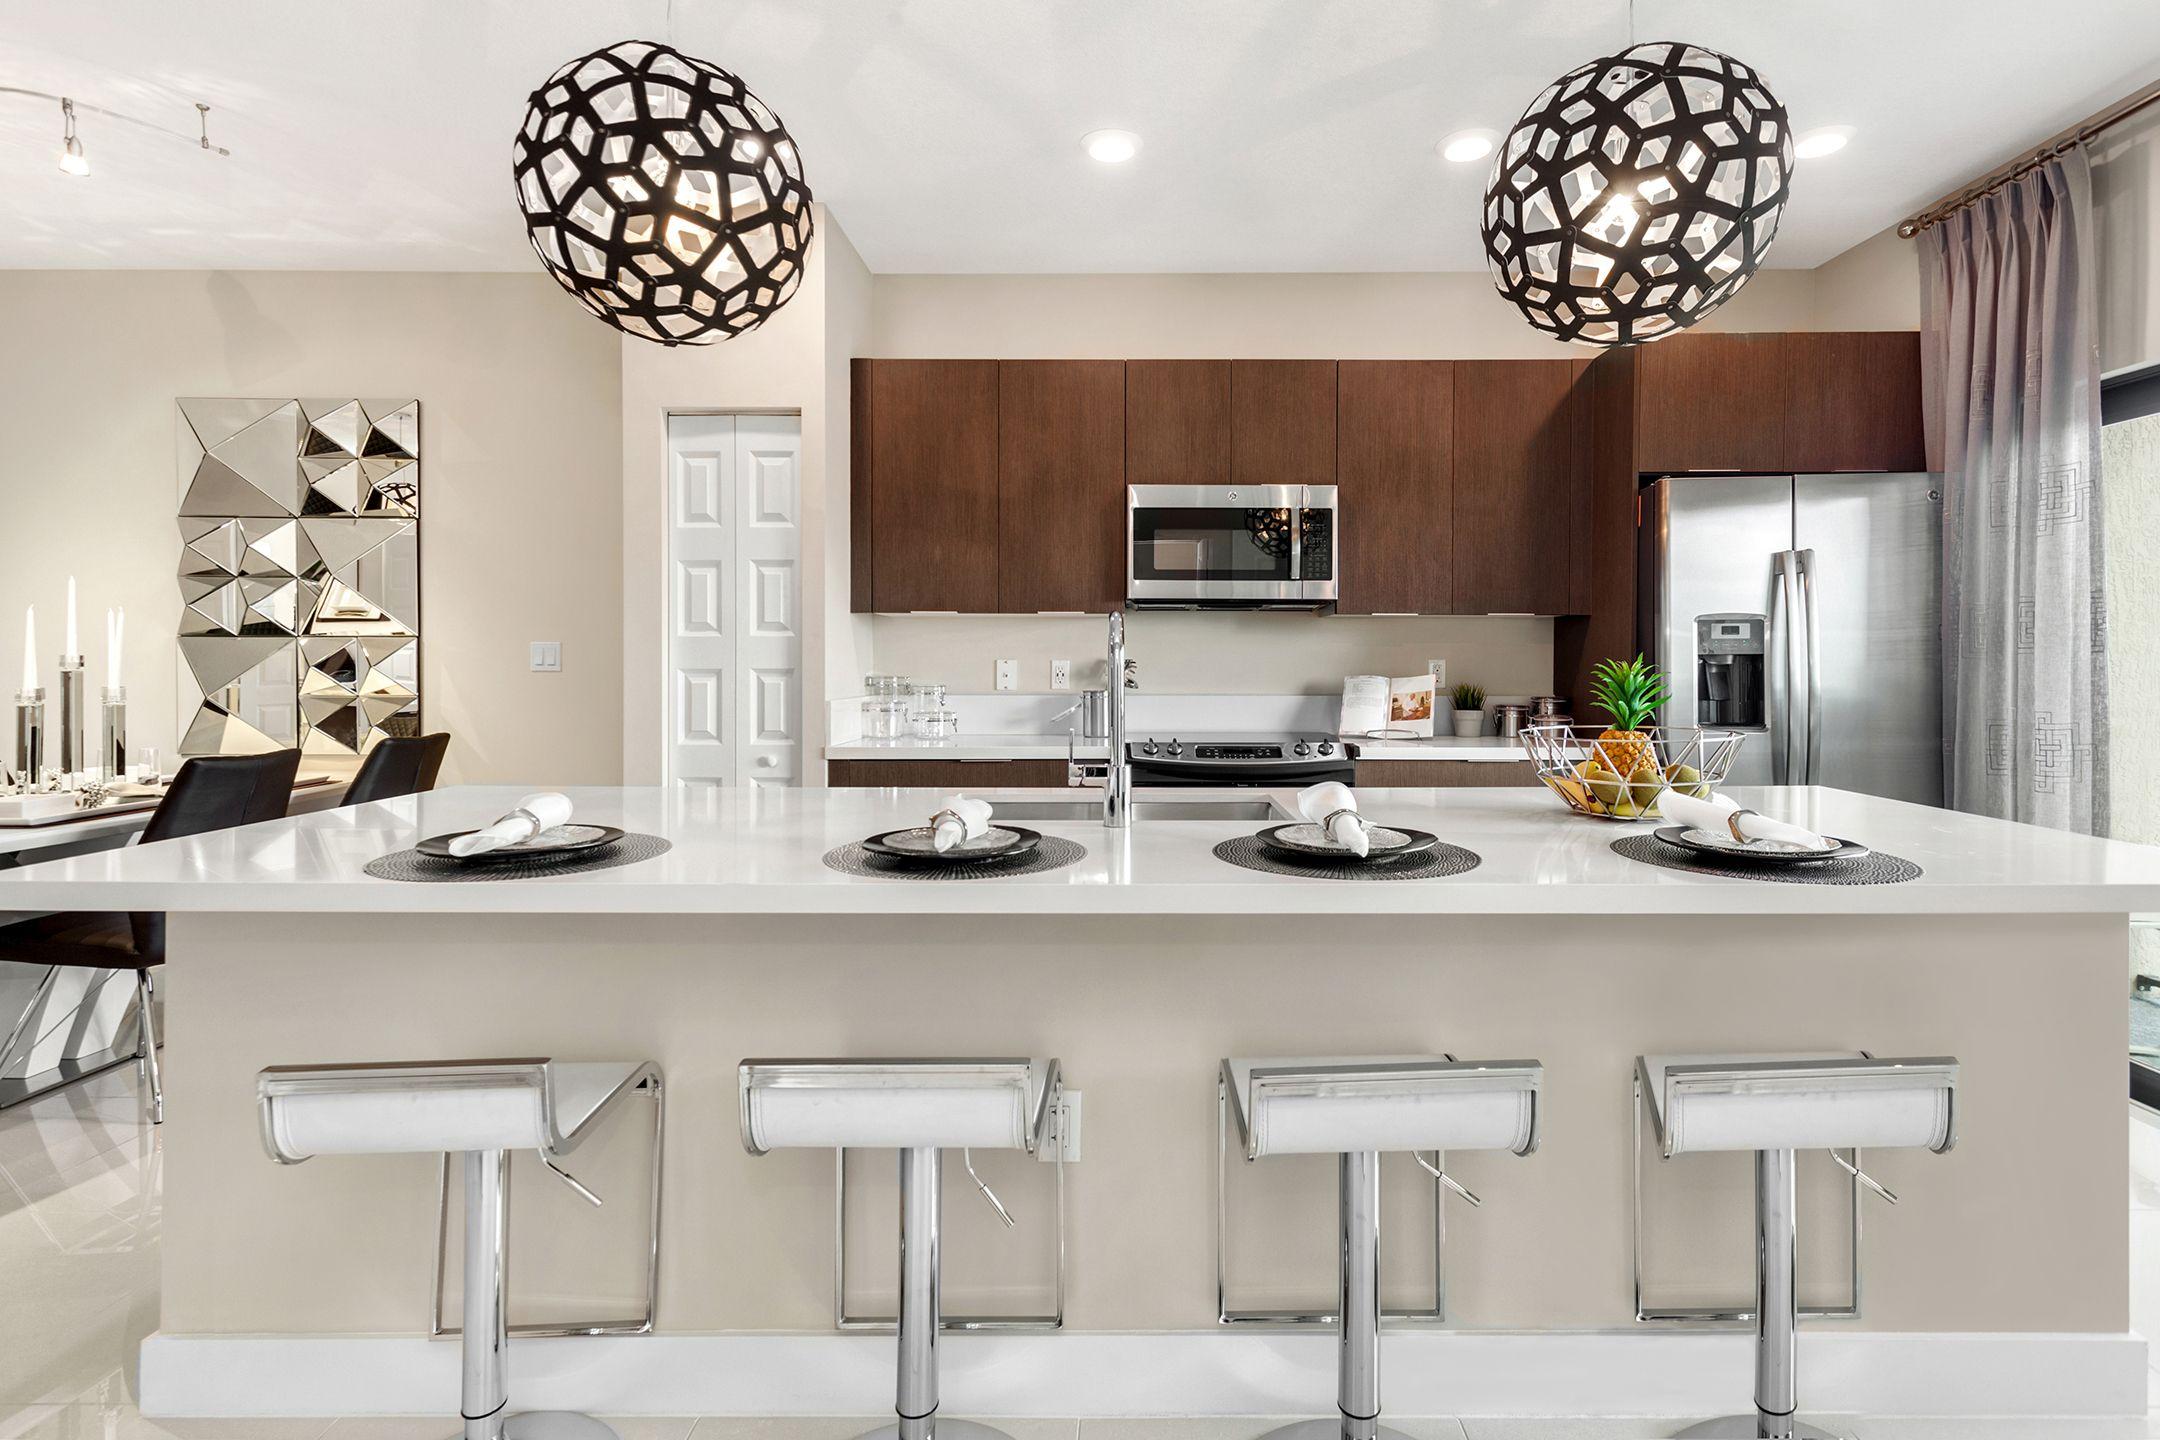 Modern Kitchen Design At Apex In Park Central S Cascade Home